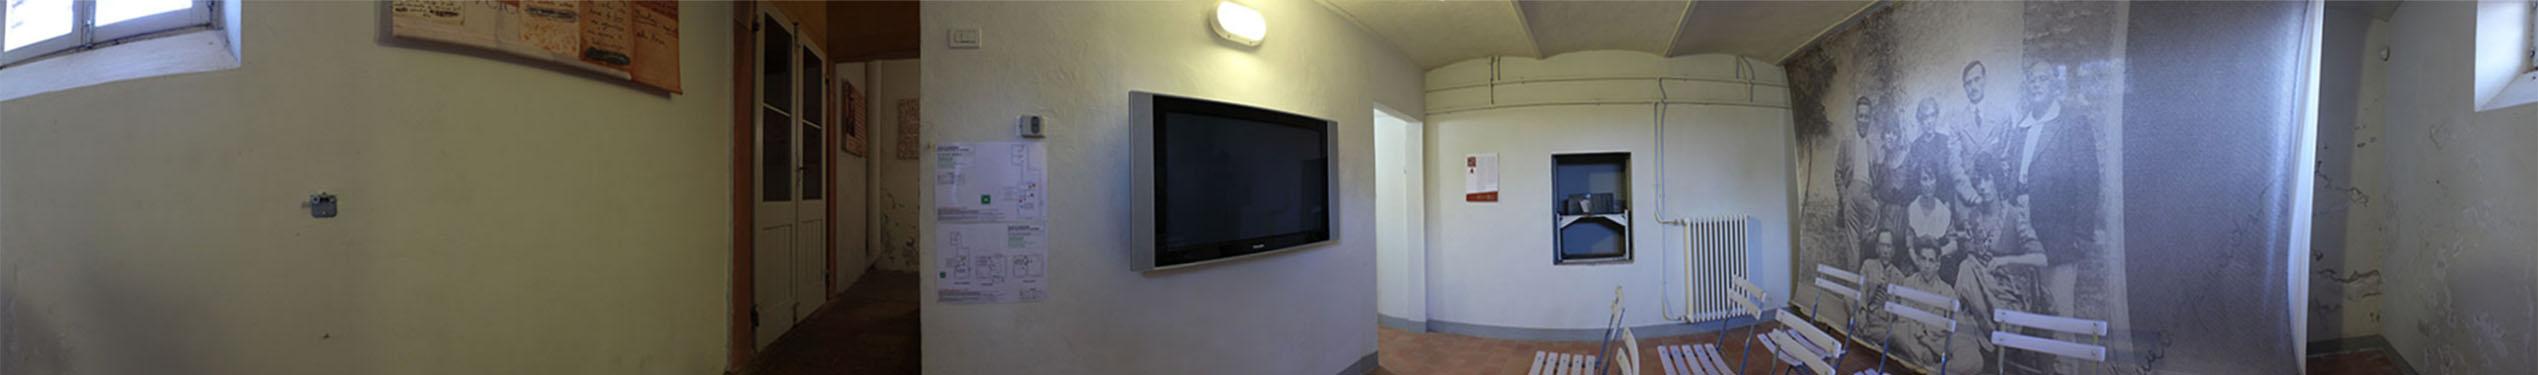 audiovisivi casa panzini